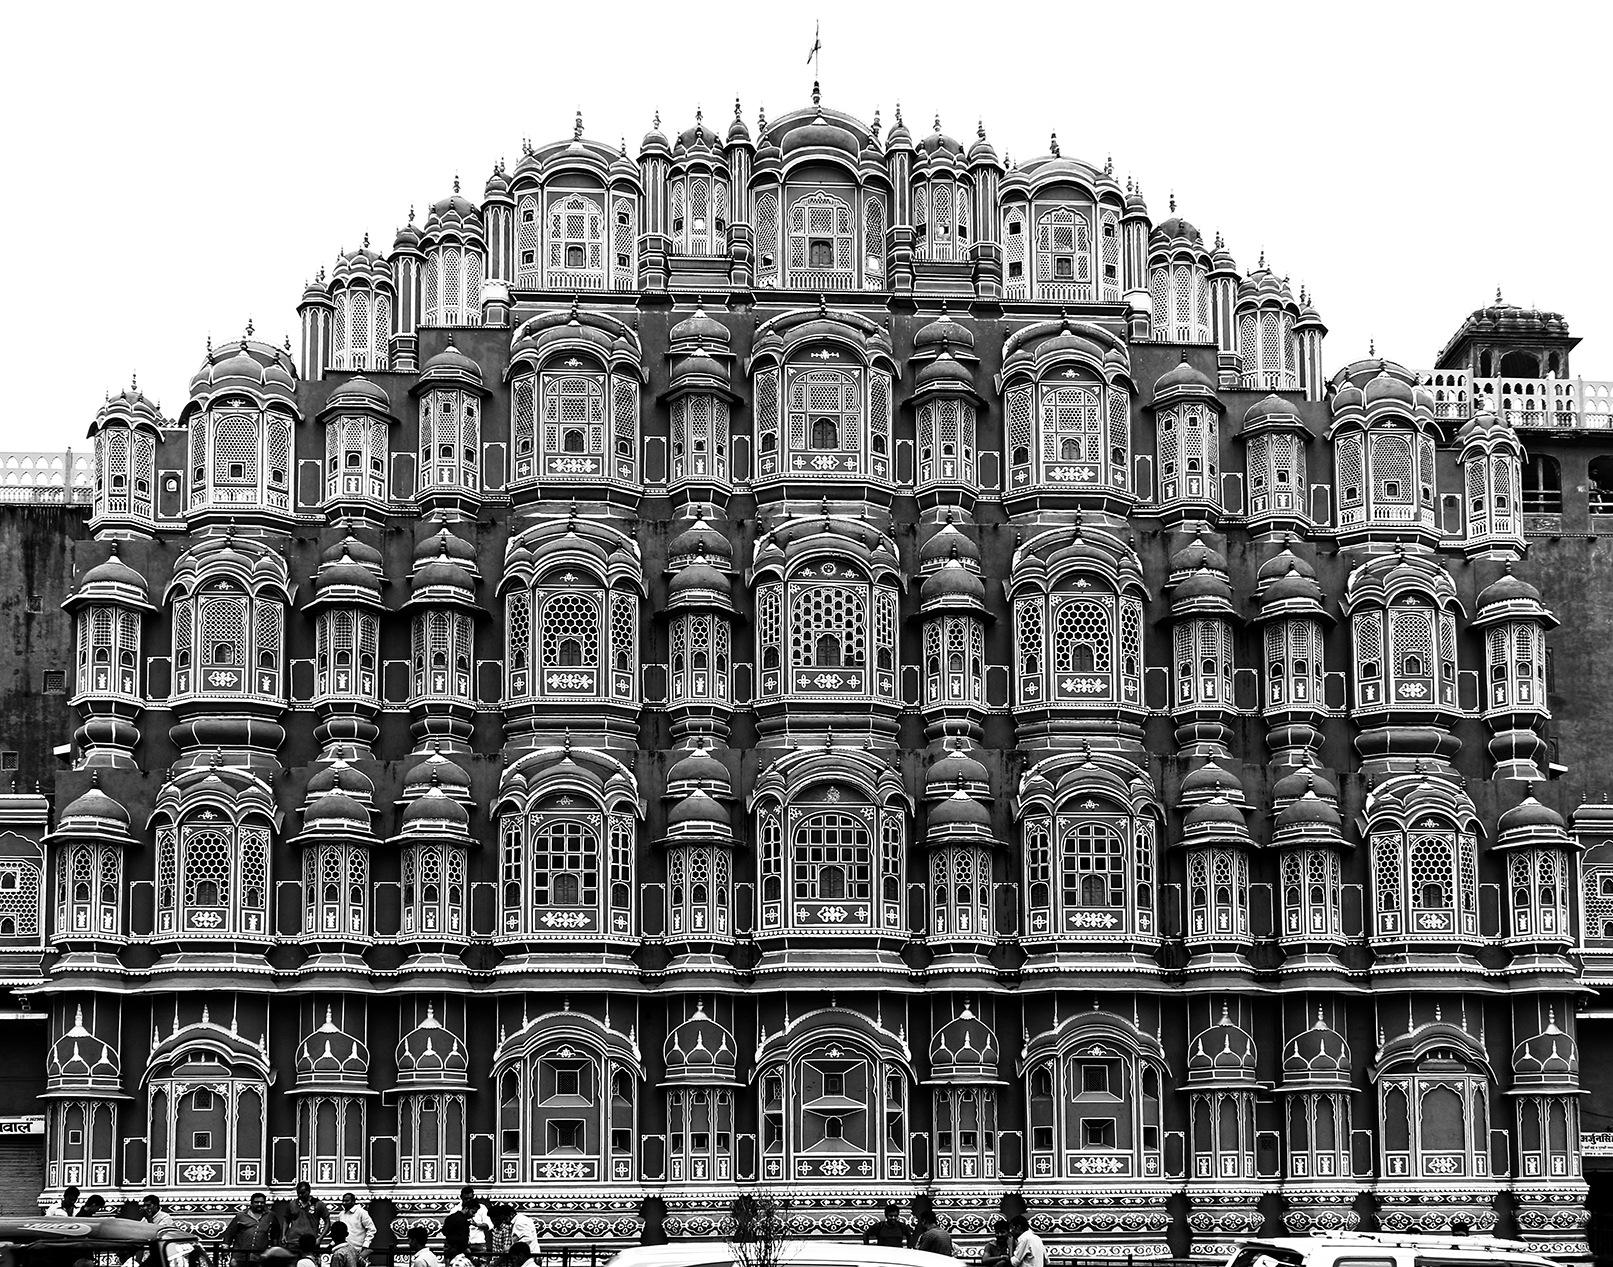 Hawa Mahal ,Jaipur , India by Ashok Kr Tyagi